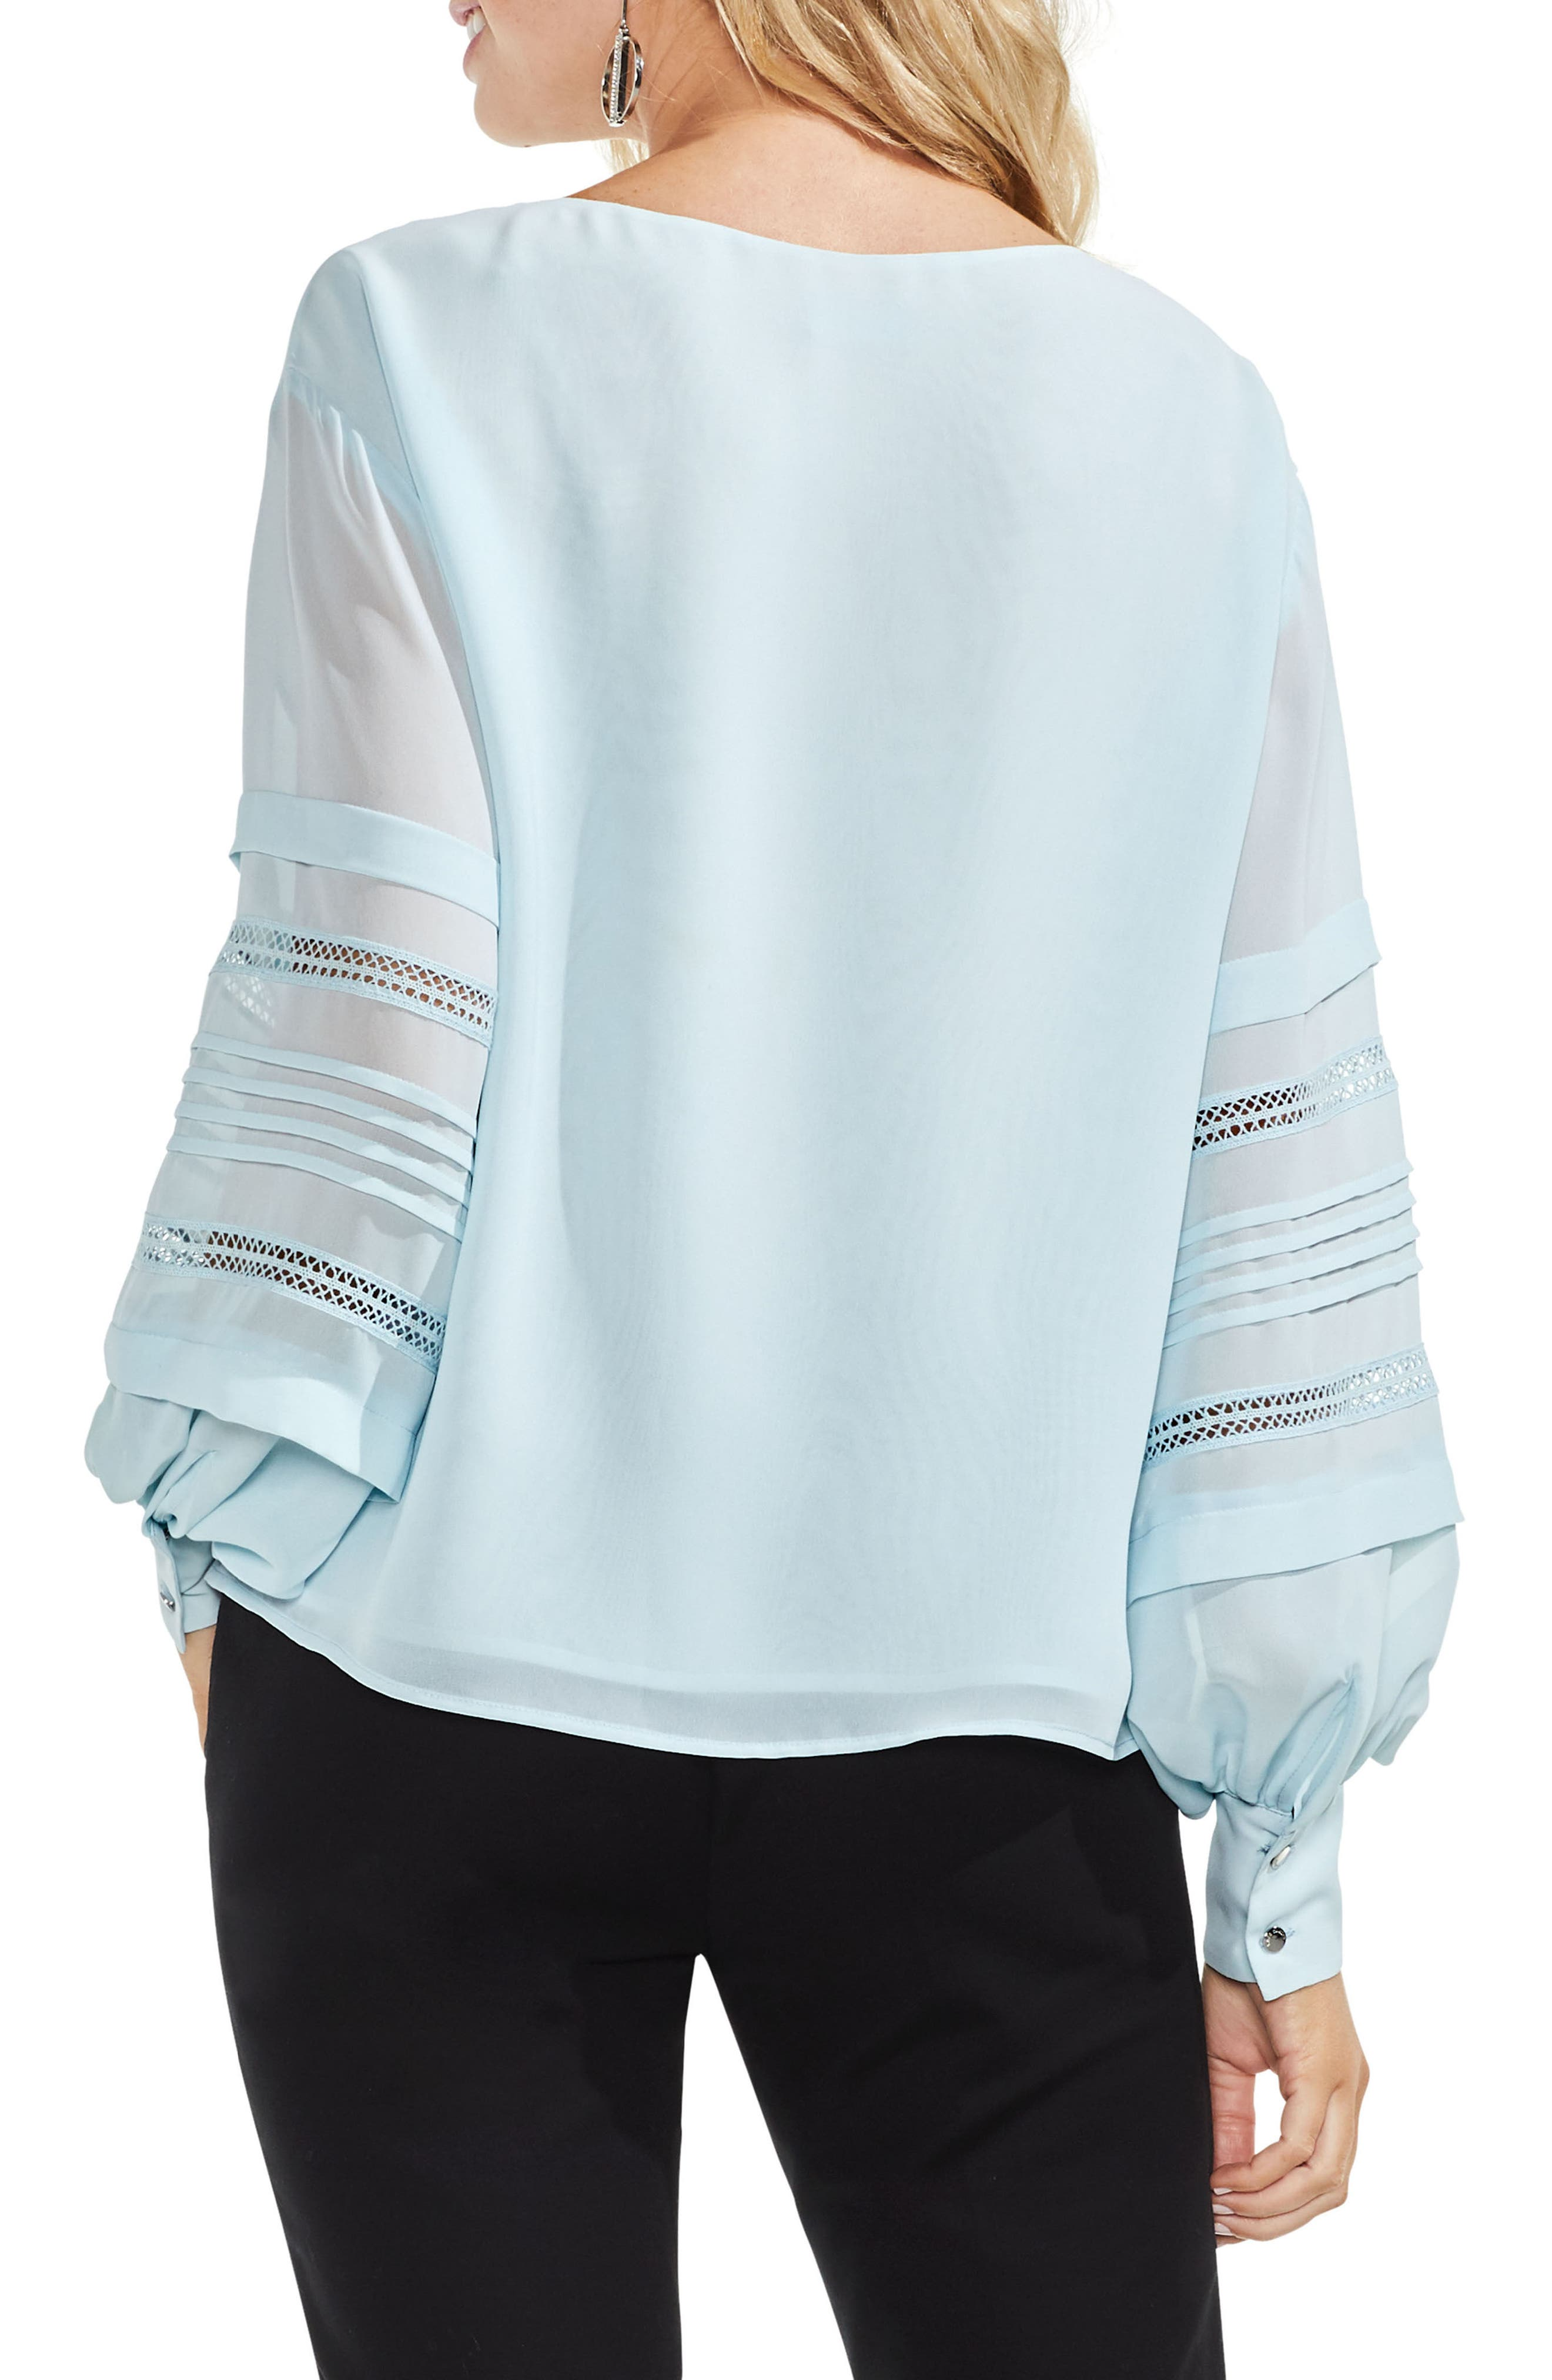 Pintuck Sleeve Blouse,                             Alternate thumbnail 2, color,                             Chalk Blue